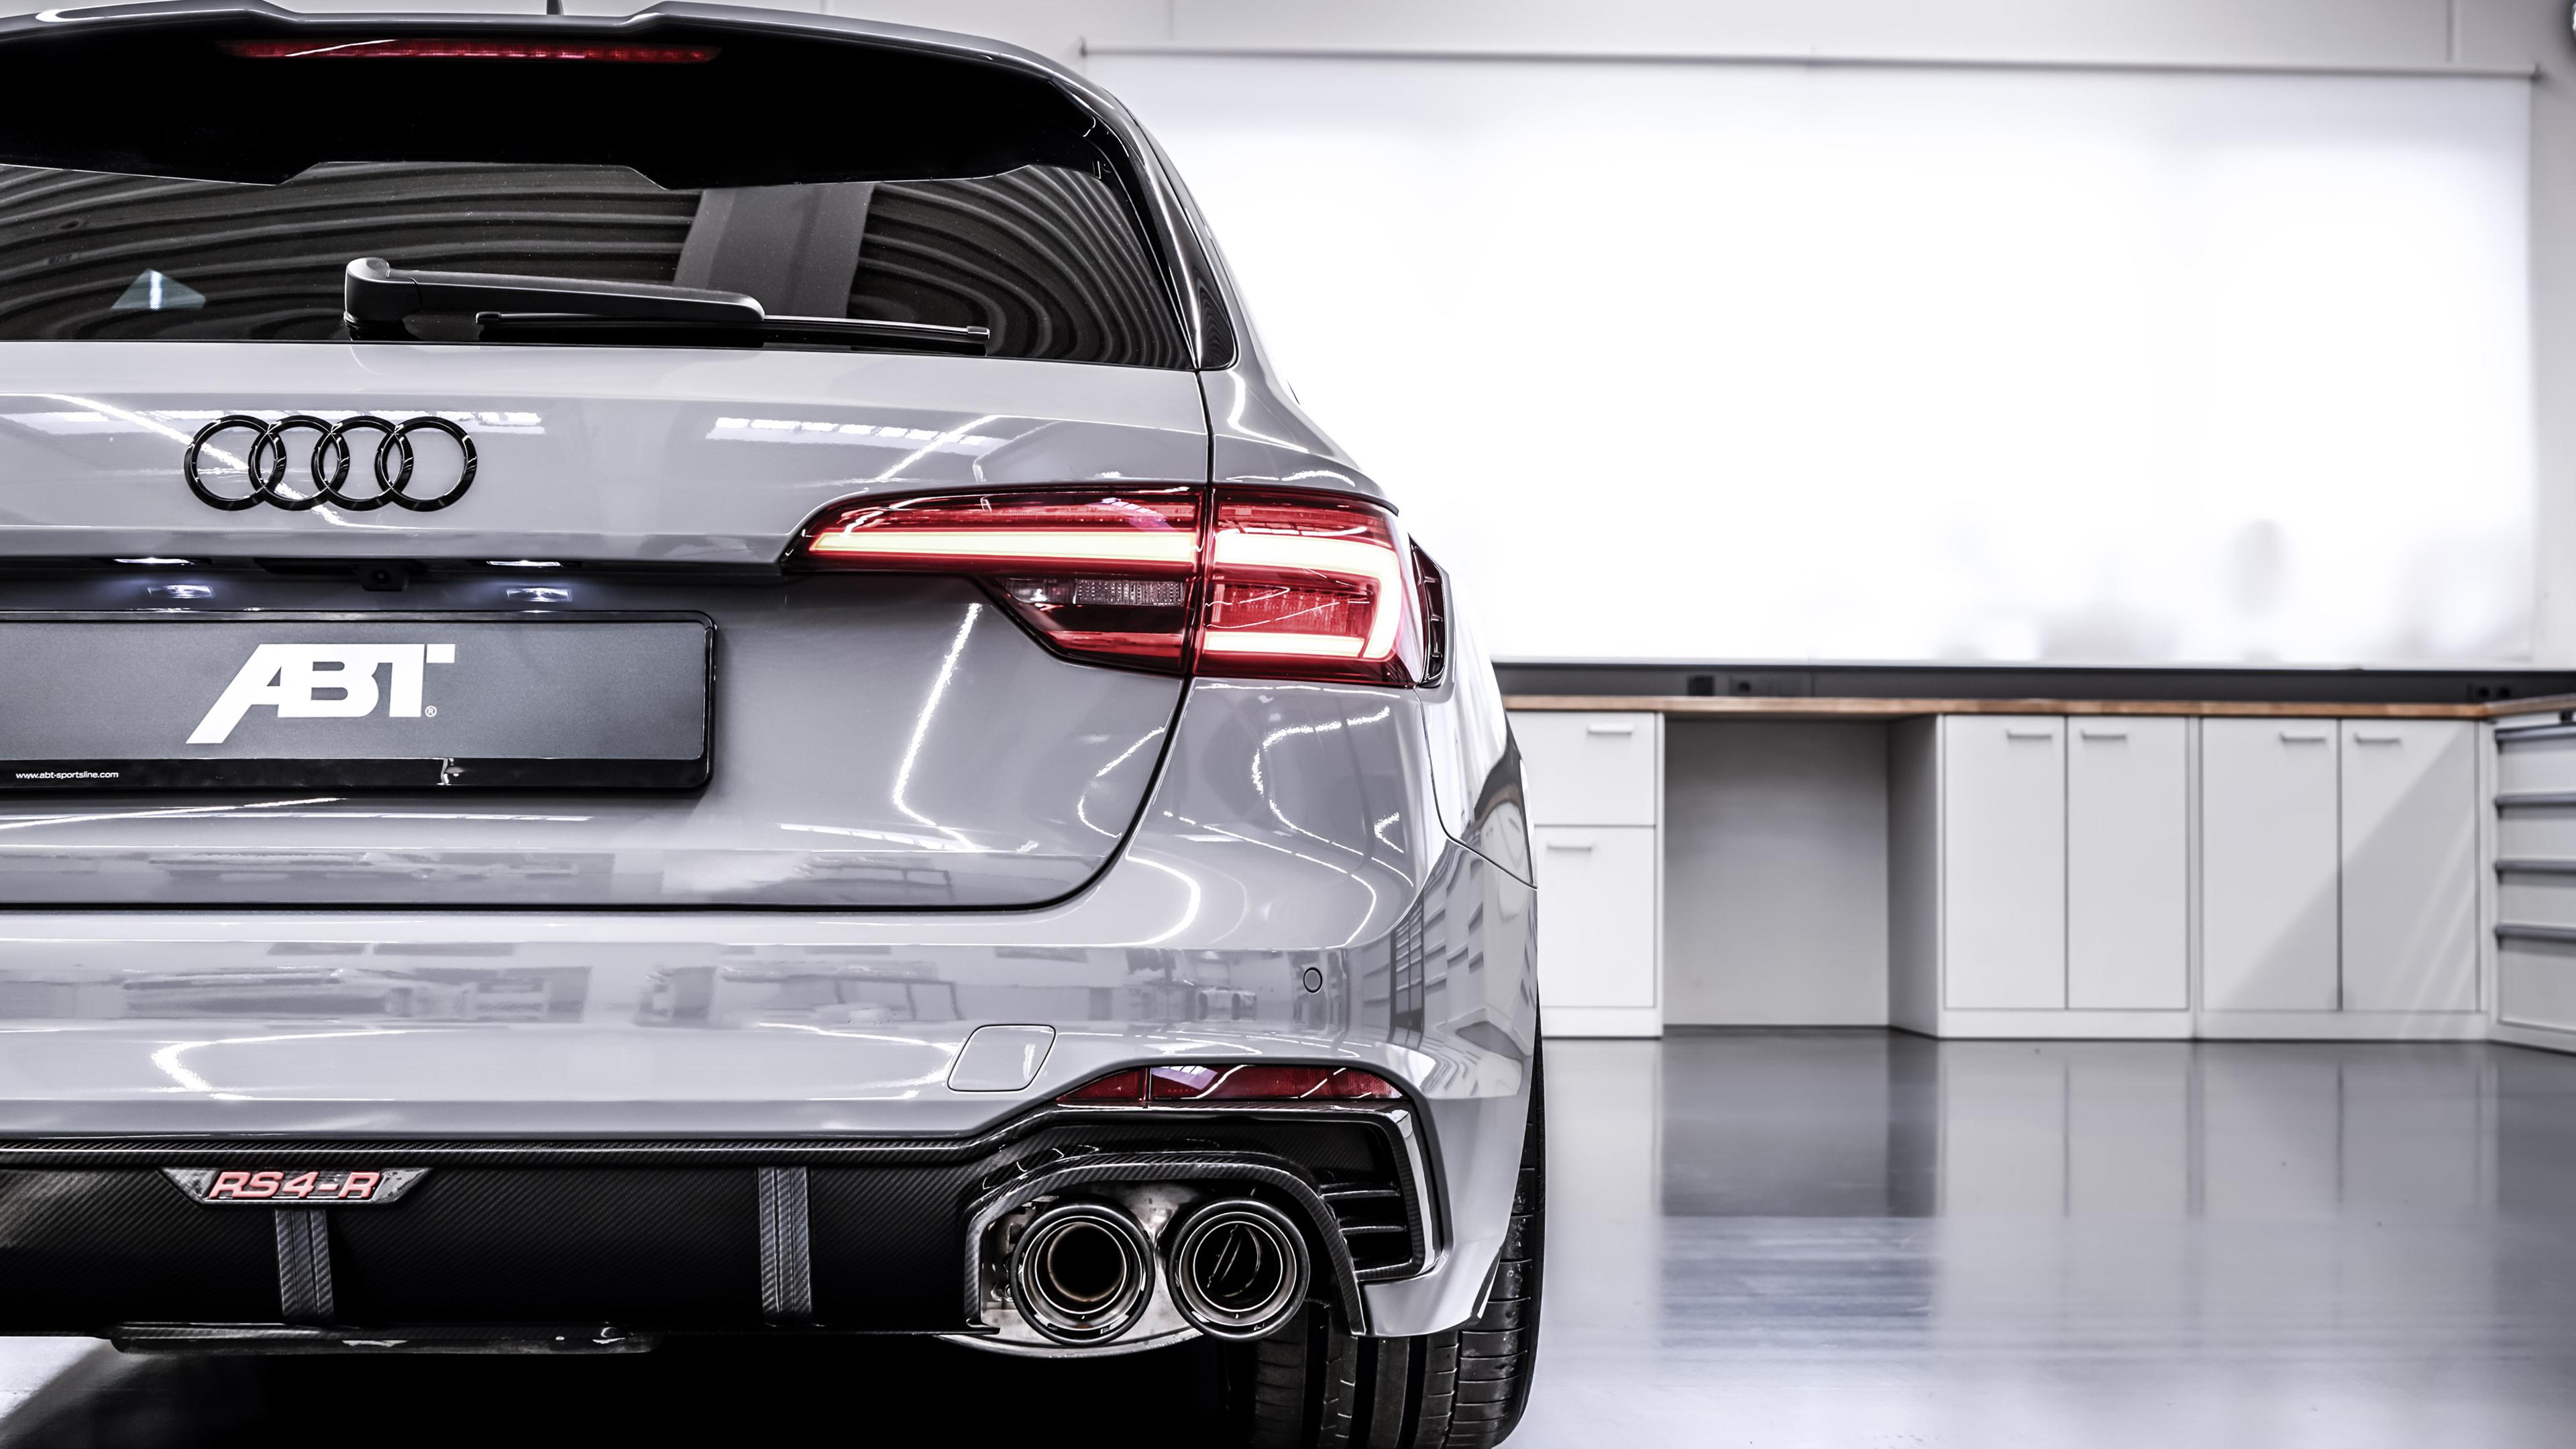 2018 Abt Audi Rs4 R Avant 4k 2 Wallpaper Hd Car Wallpapers Id 9768